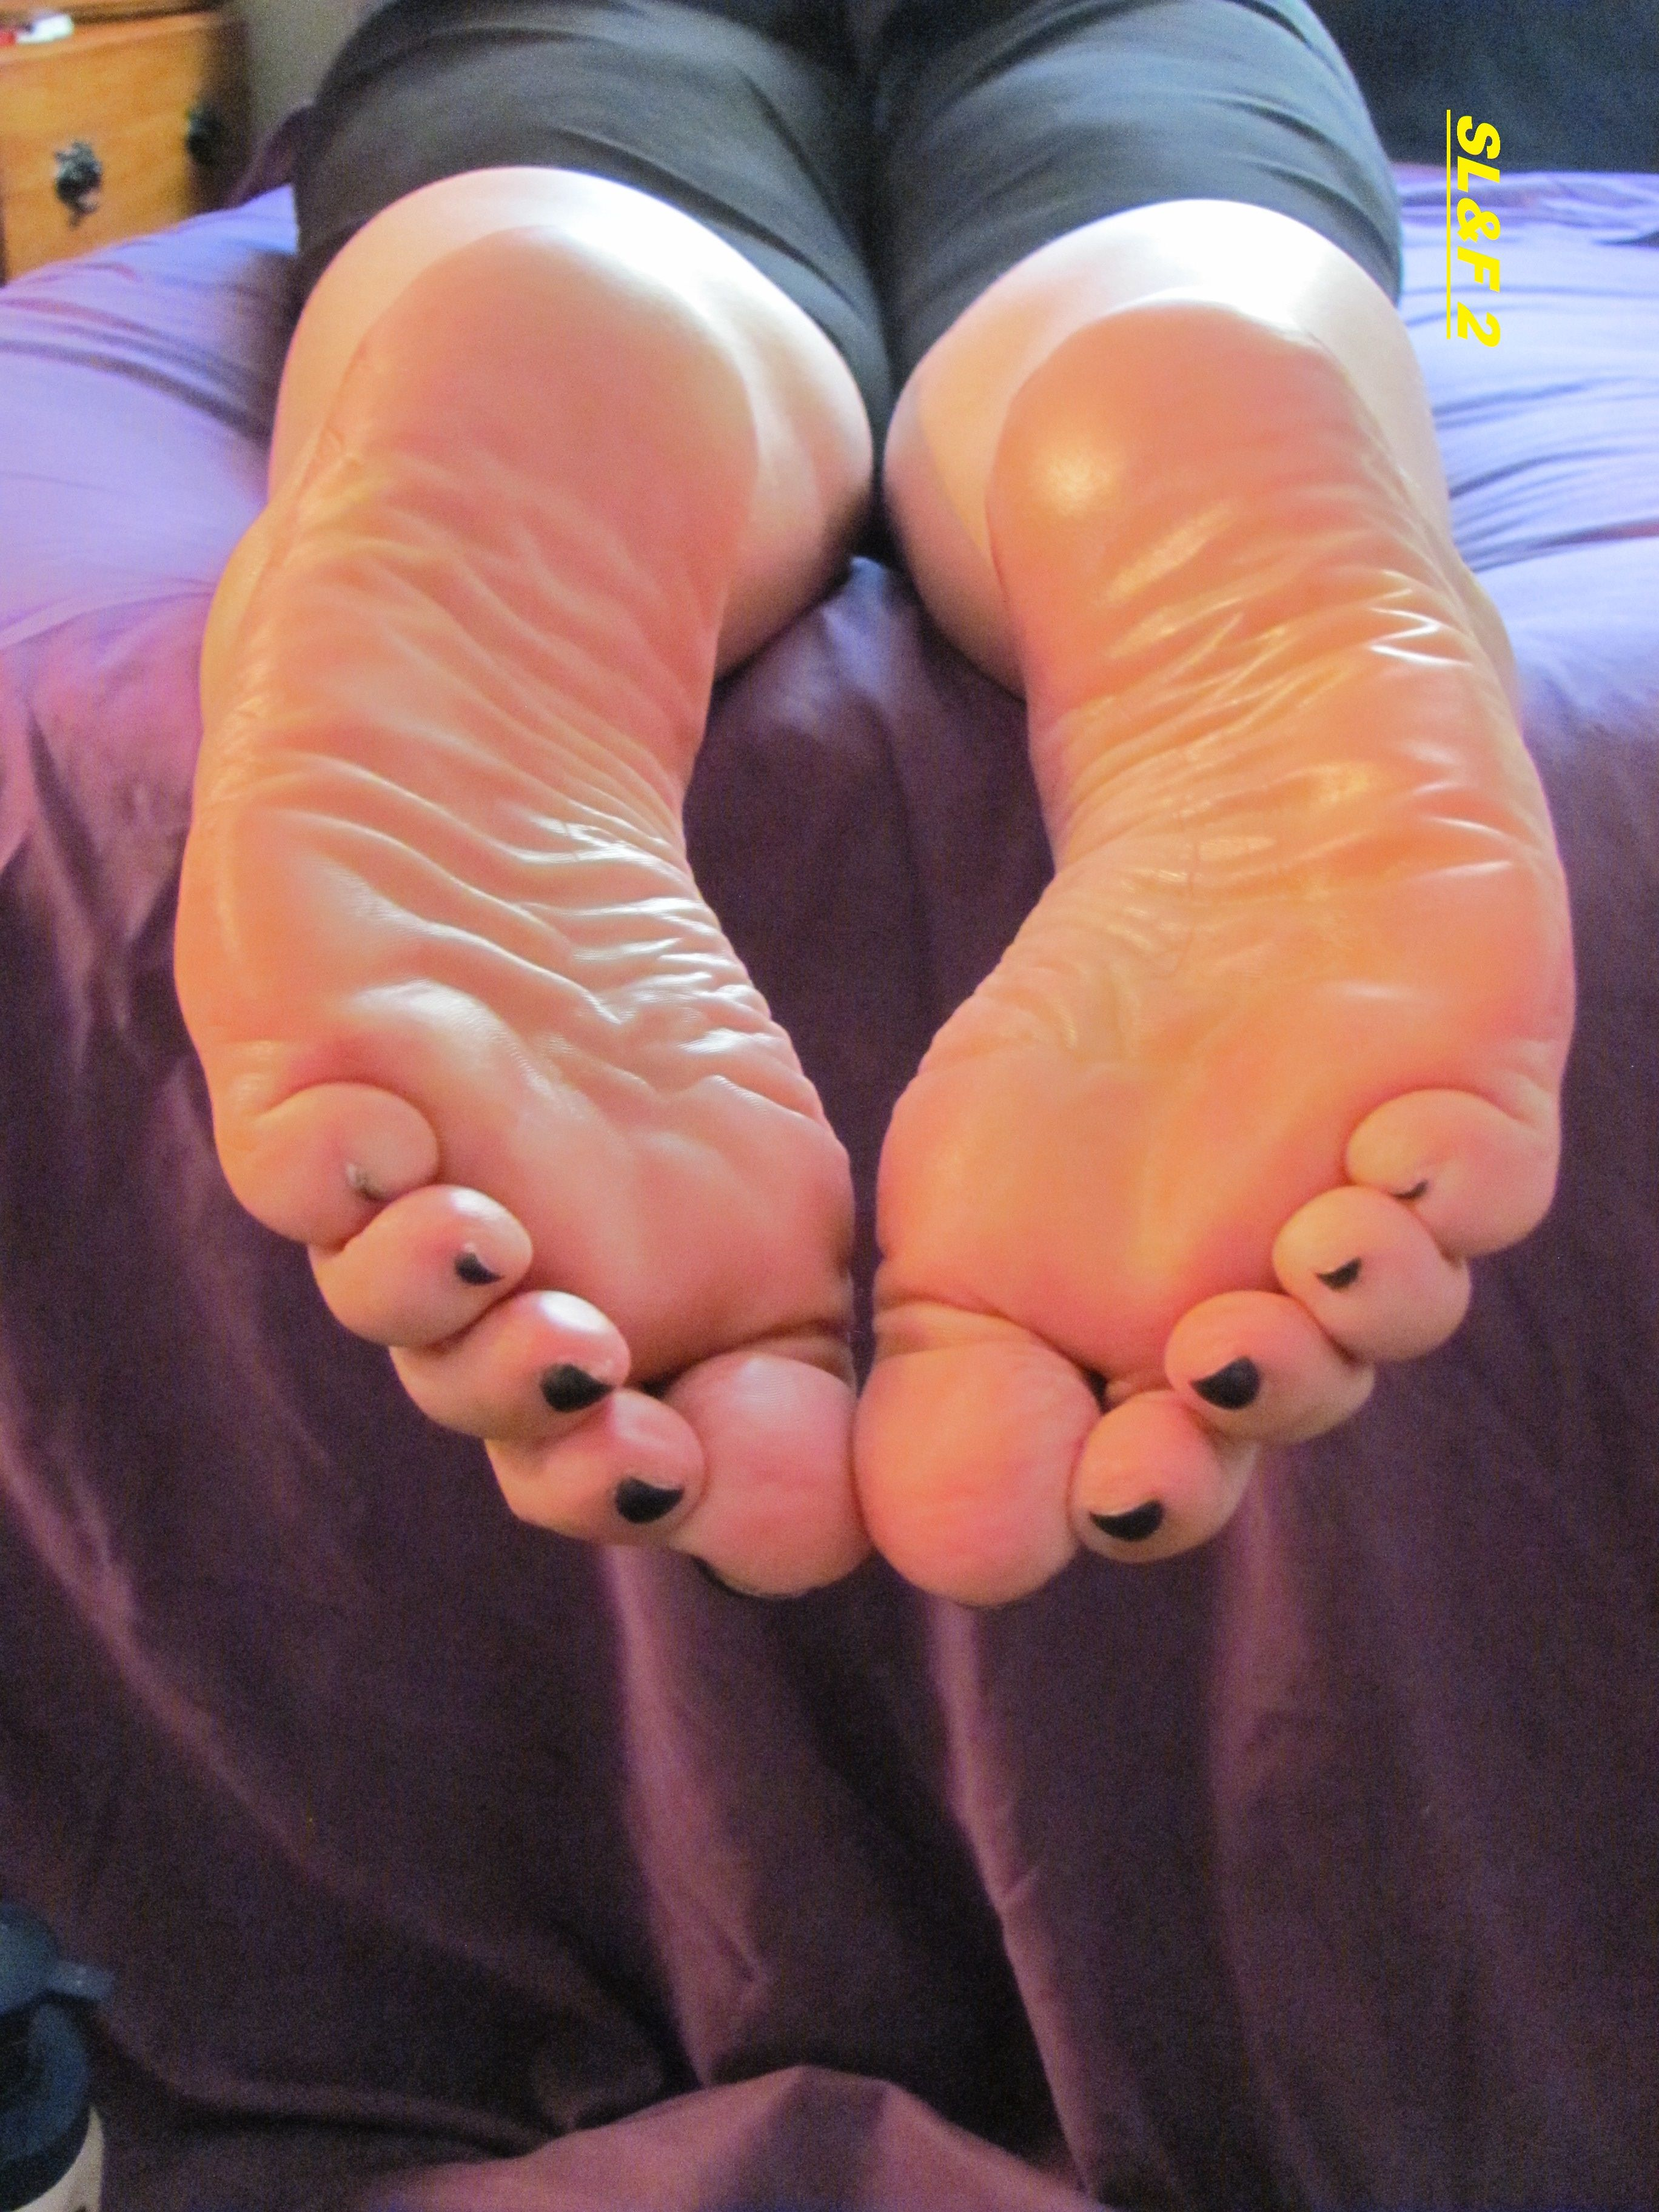 Wifes sexy feet